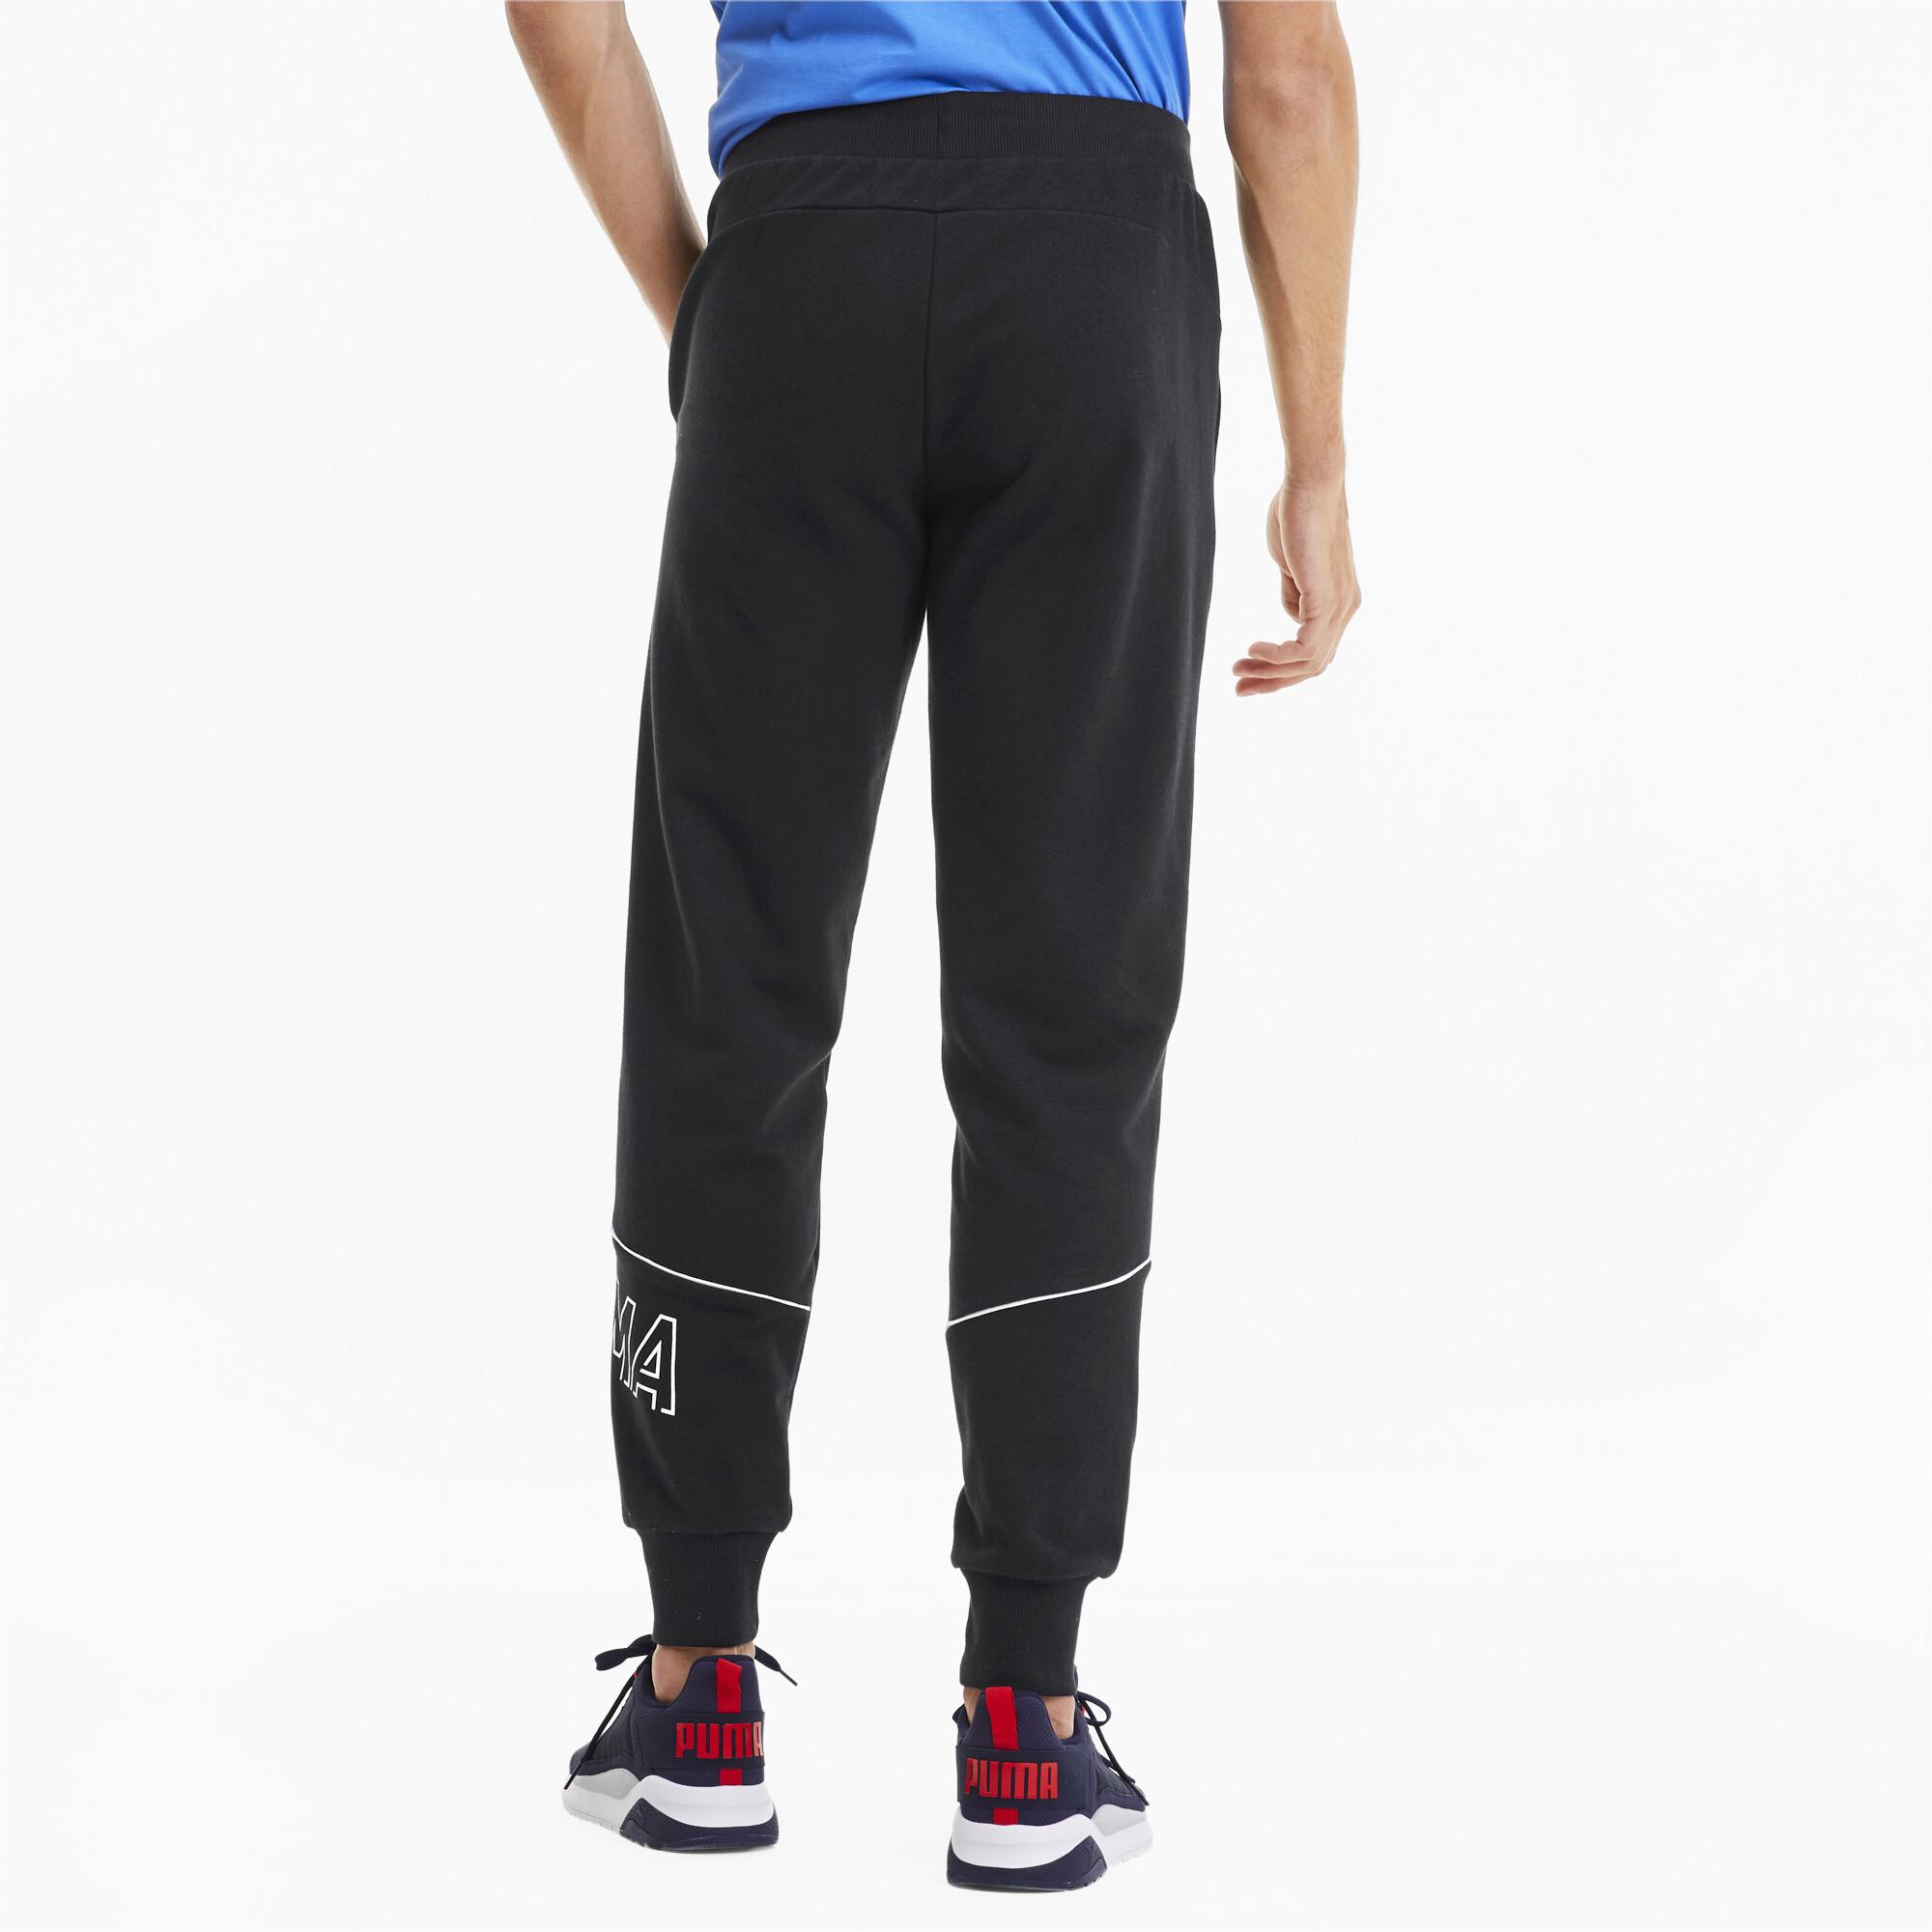 PUMA-Men-039-s-Modern-Sports-Sweatpants thumbnail 10